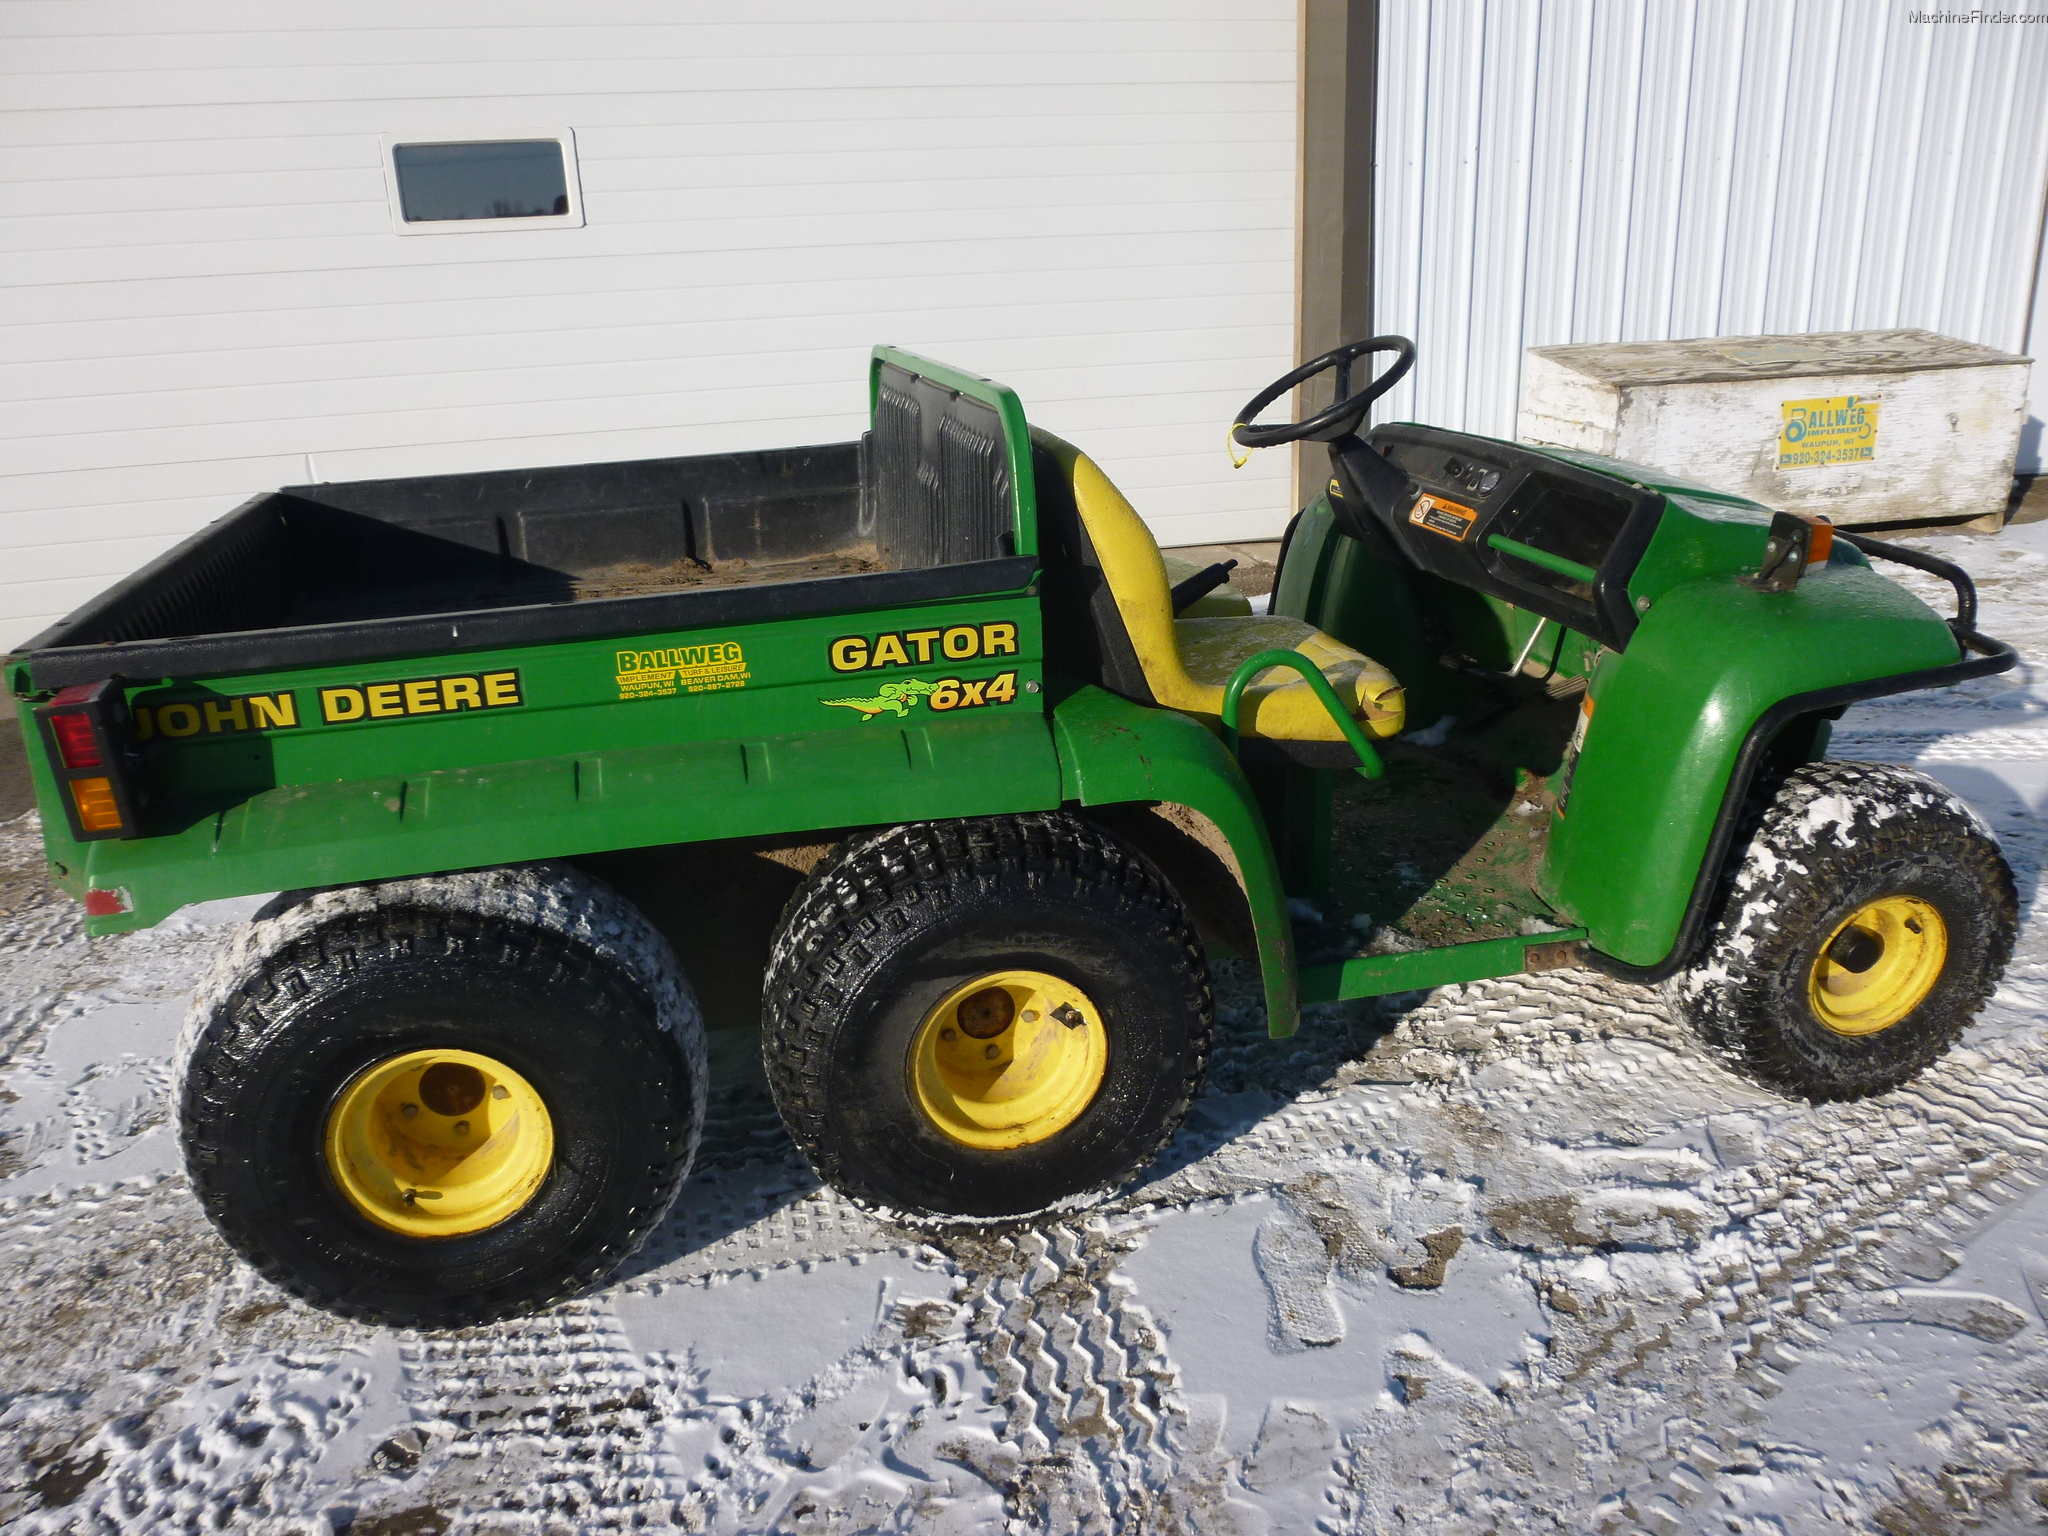 John Deere 6x4 Gator Parts. John Deere 6x4 Gator Parts 6 Ecighq. John Deere. John Deere Gator 6x4 Cooling System Diagram At Scoala.co